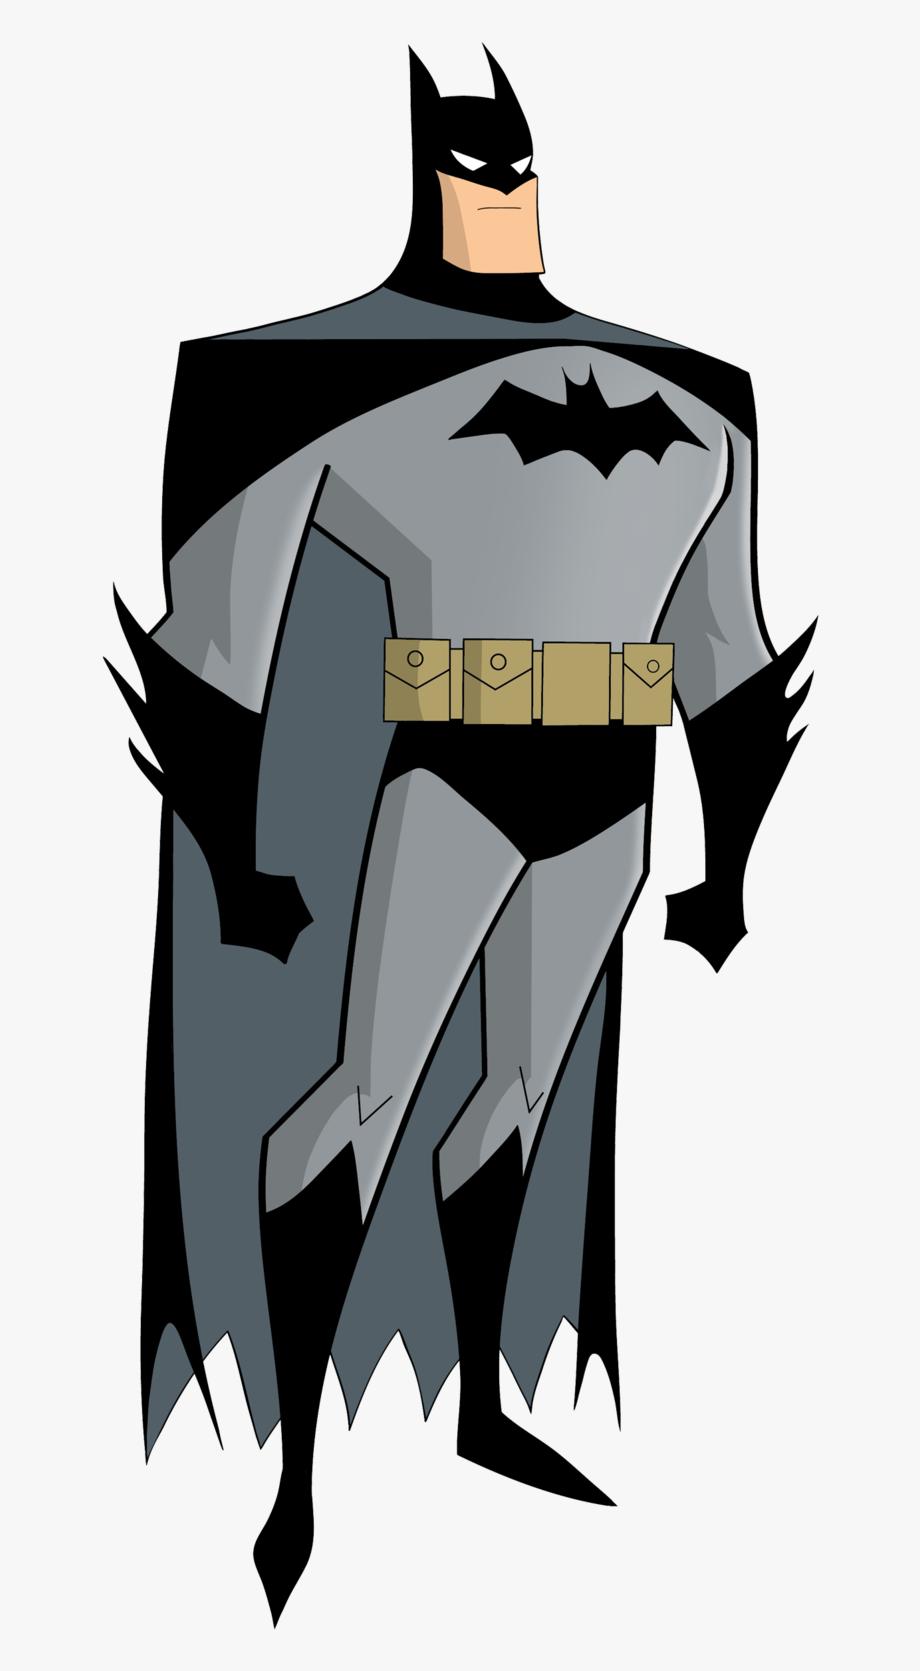 Download Joker Clipart Old Batman Cartoon And 2019.